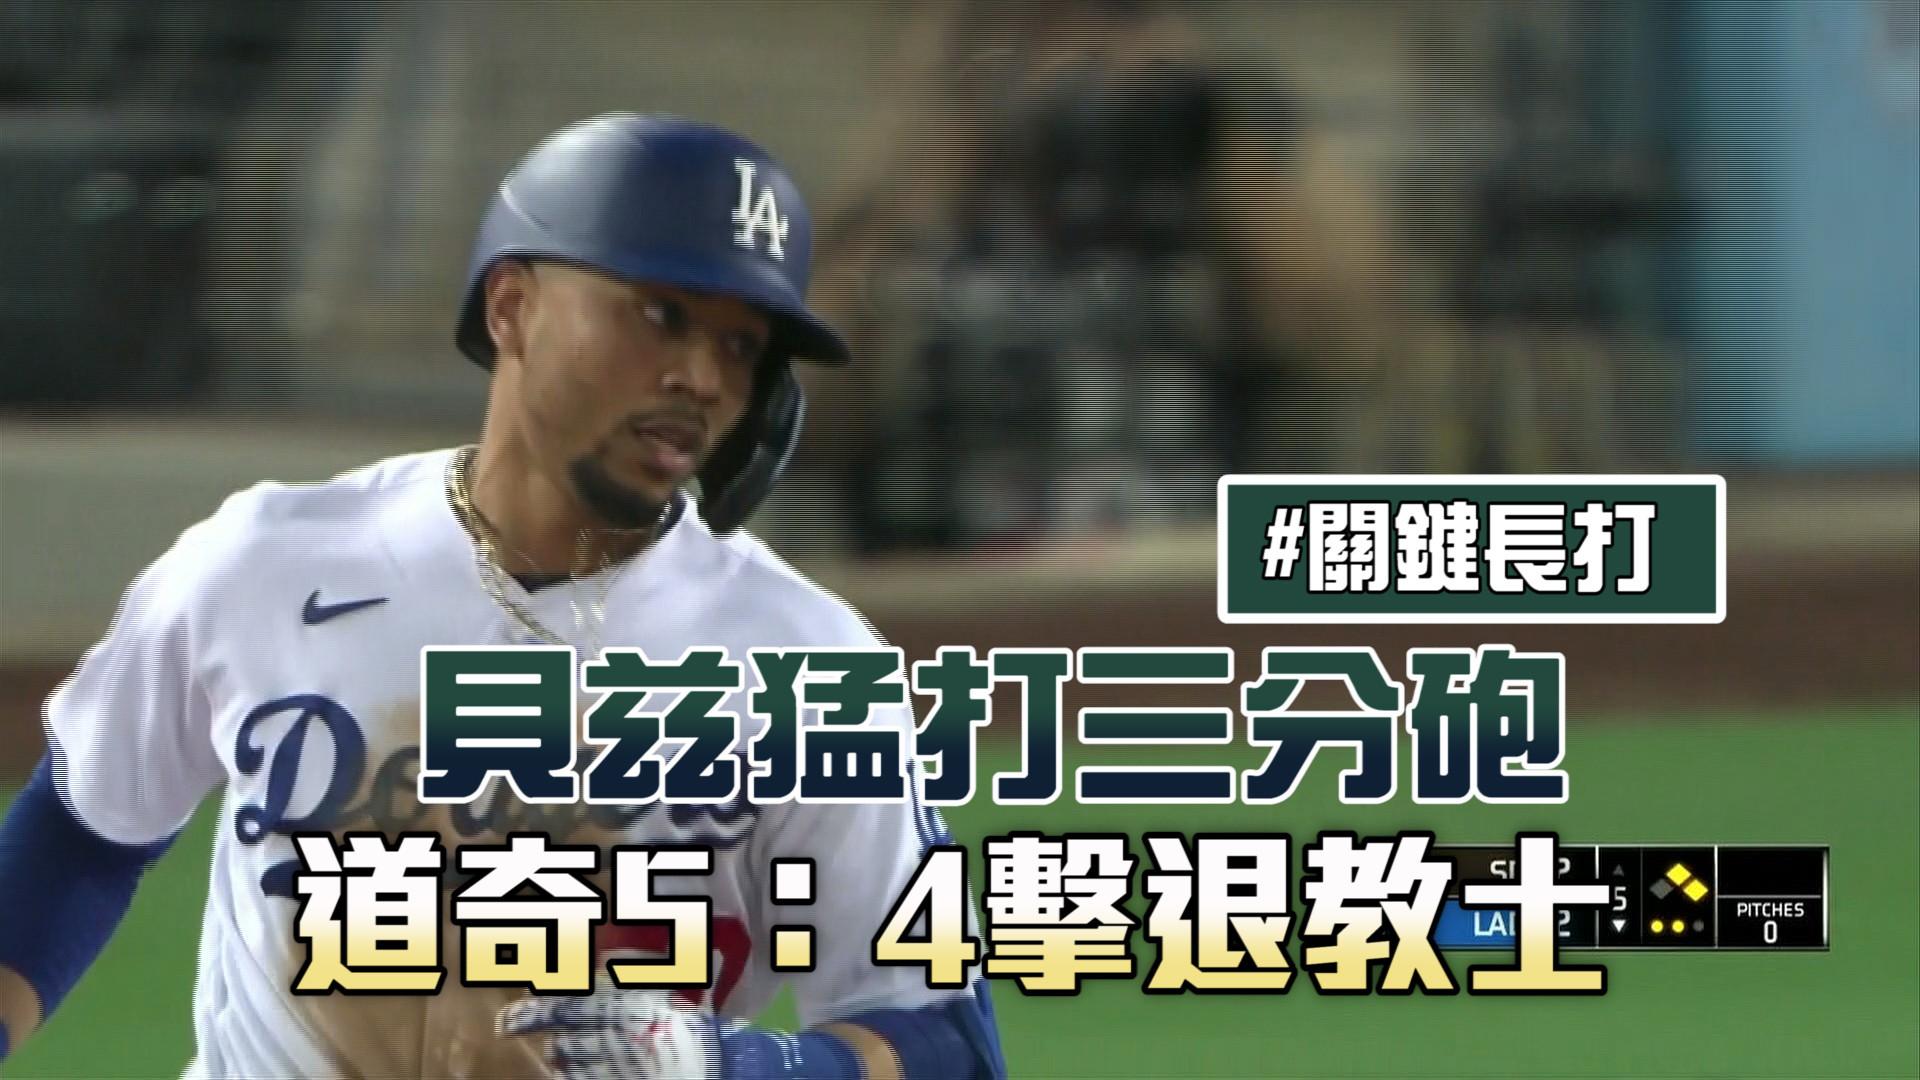 【MLB看愛爾達】貝茲猛打三分砲 道奇5:4擊退教士 09/12